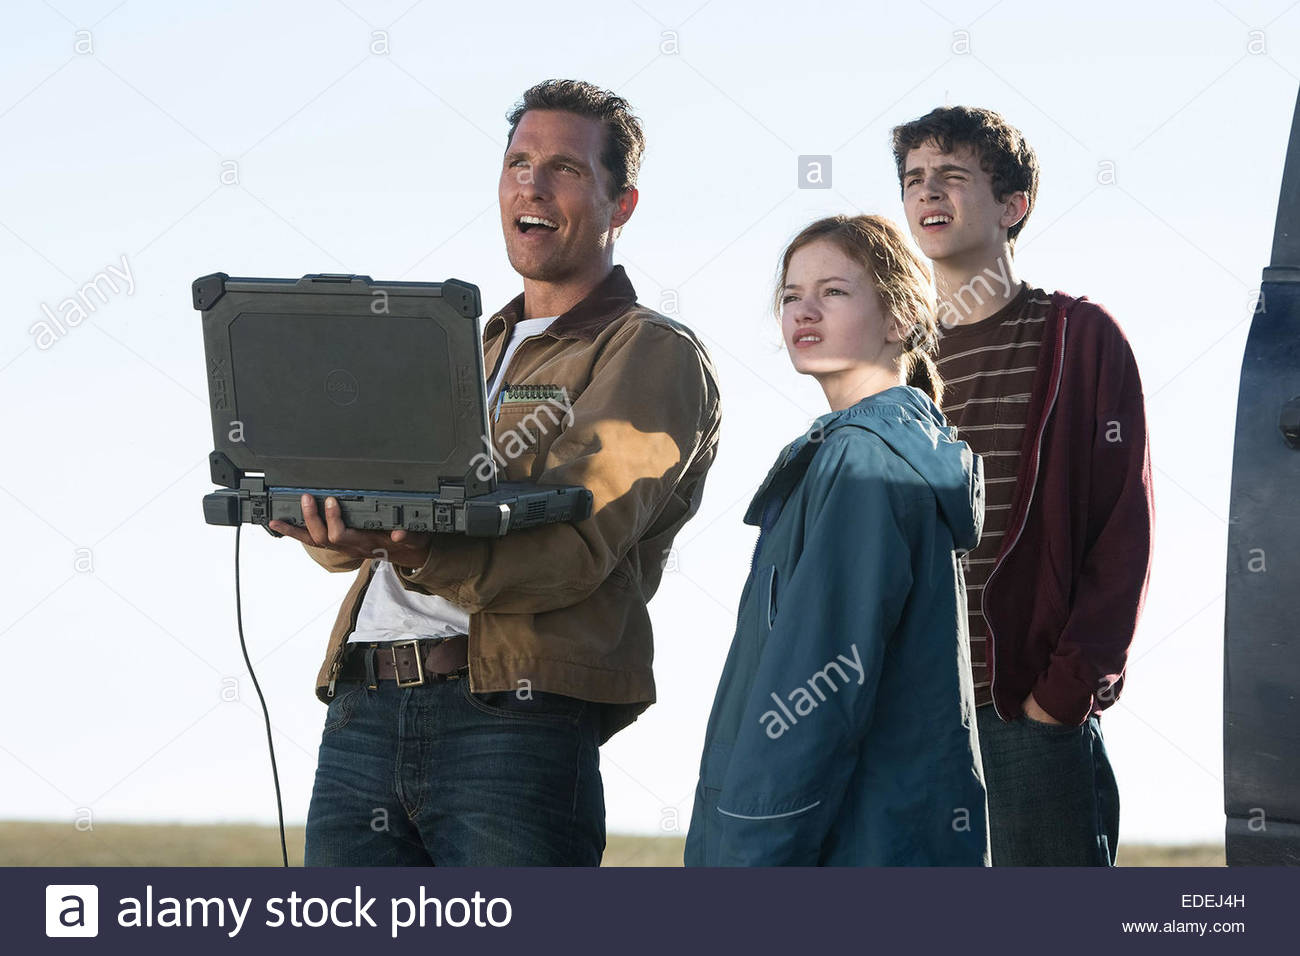 INTERSTELLAR (2014) MATTHEW MCCONAUGHEY, MACKENZIE FOY, TIMOTHEE CHALAMET CHRISTOPHER NOLAN (DIR) MOVIESTORE COLLECTION - Stock Image